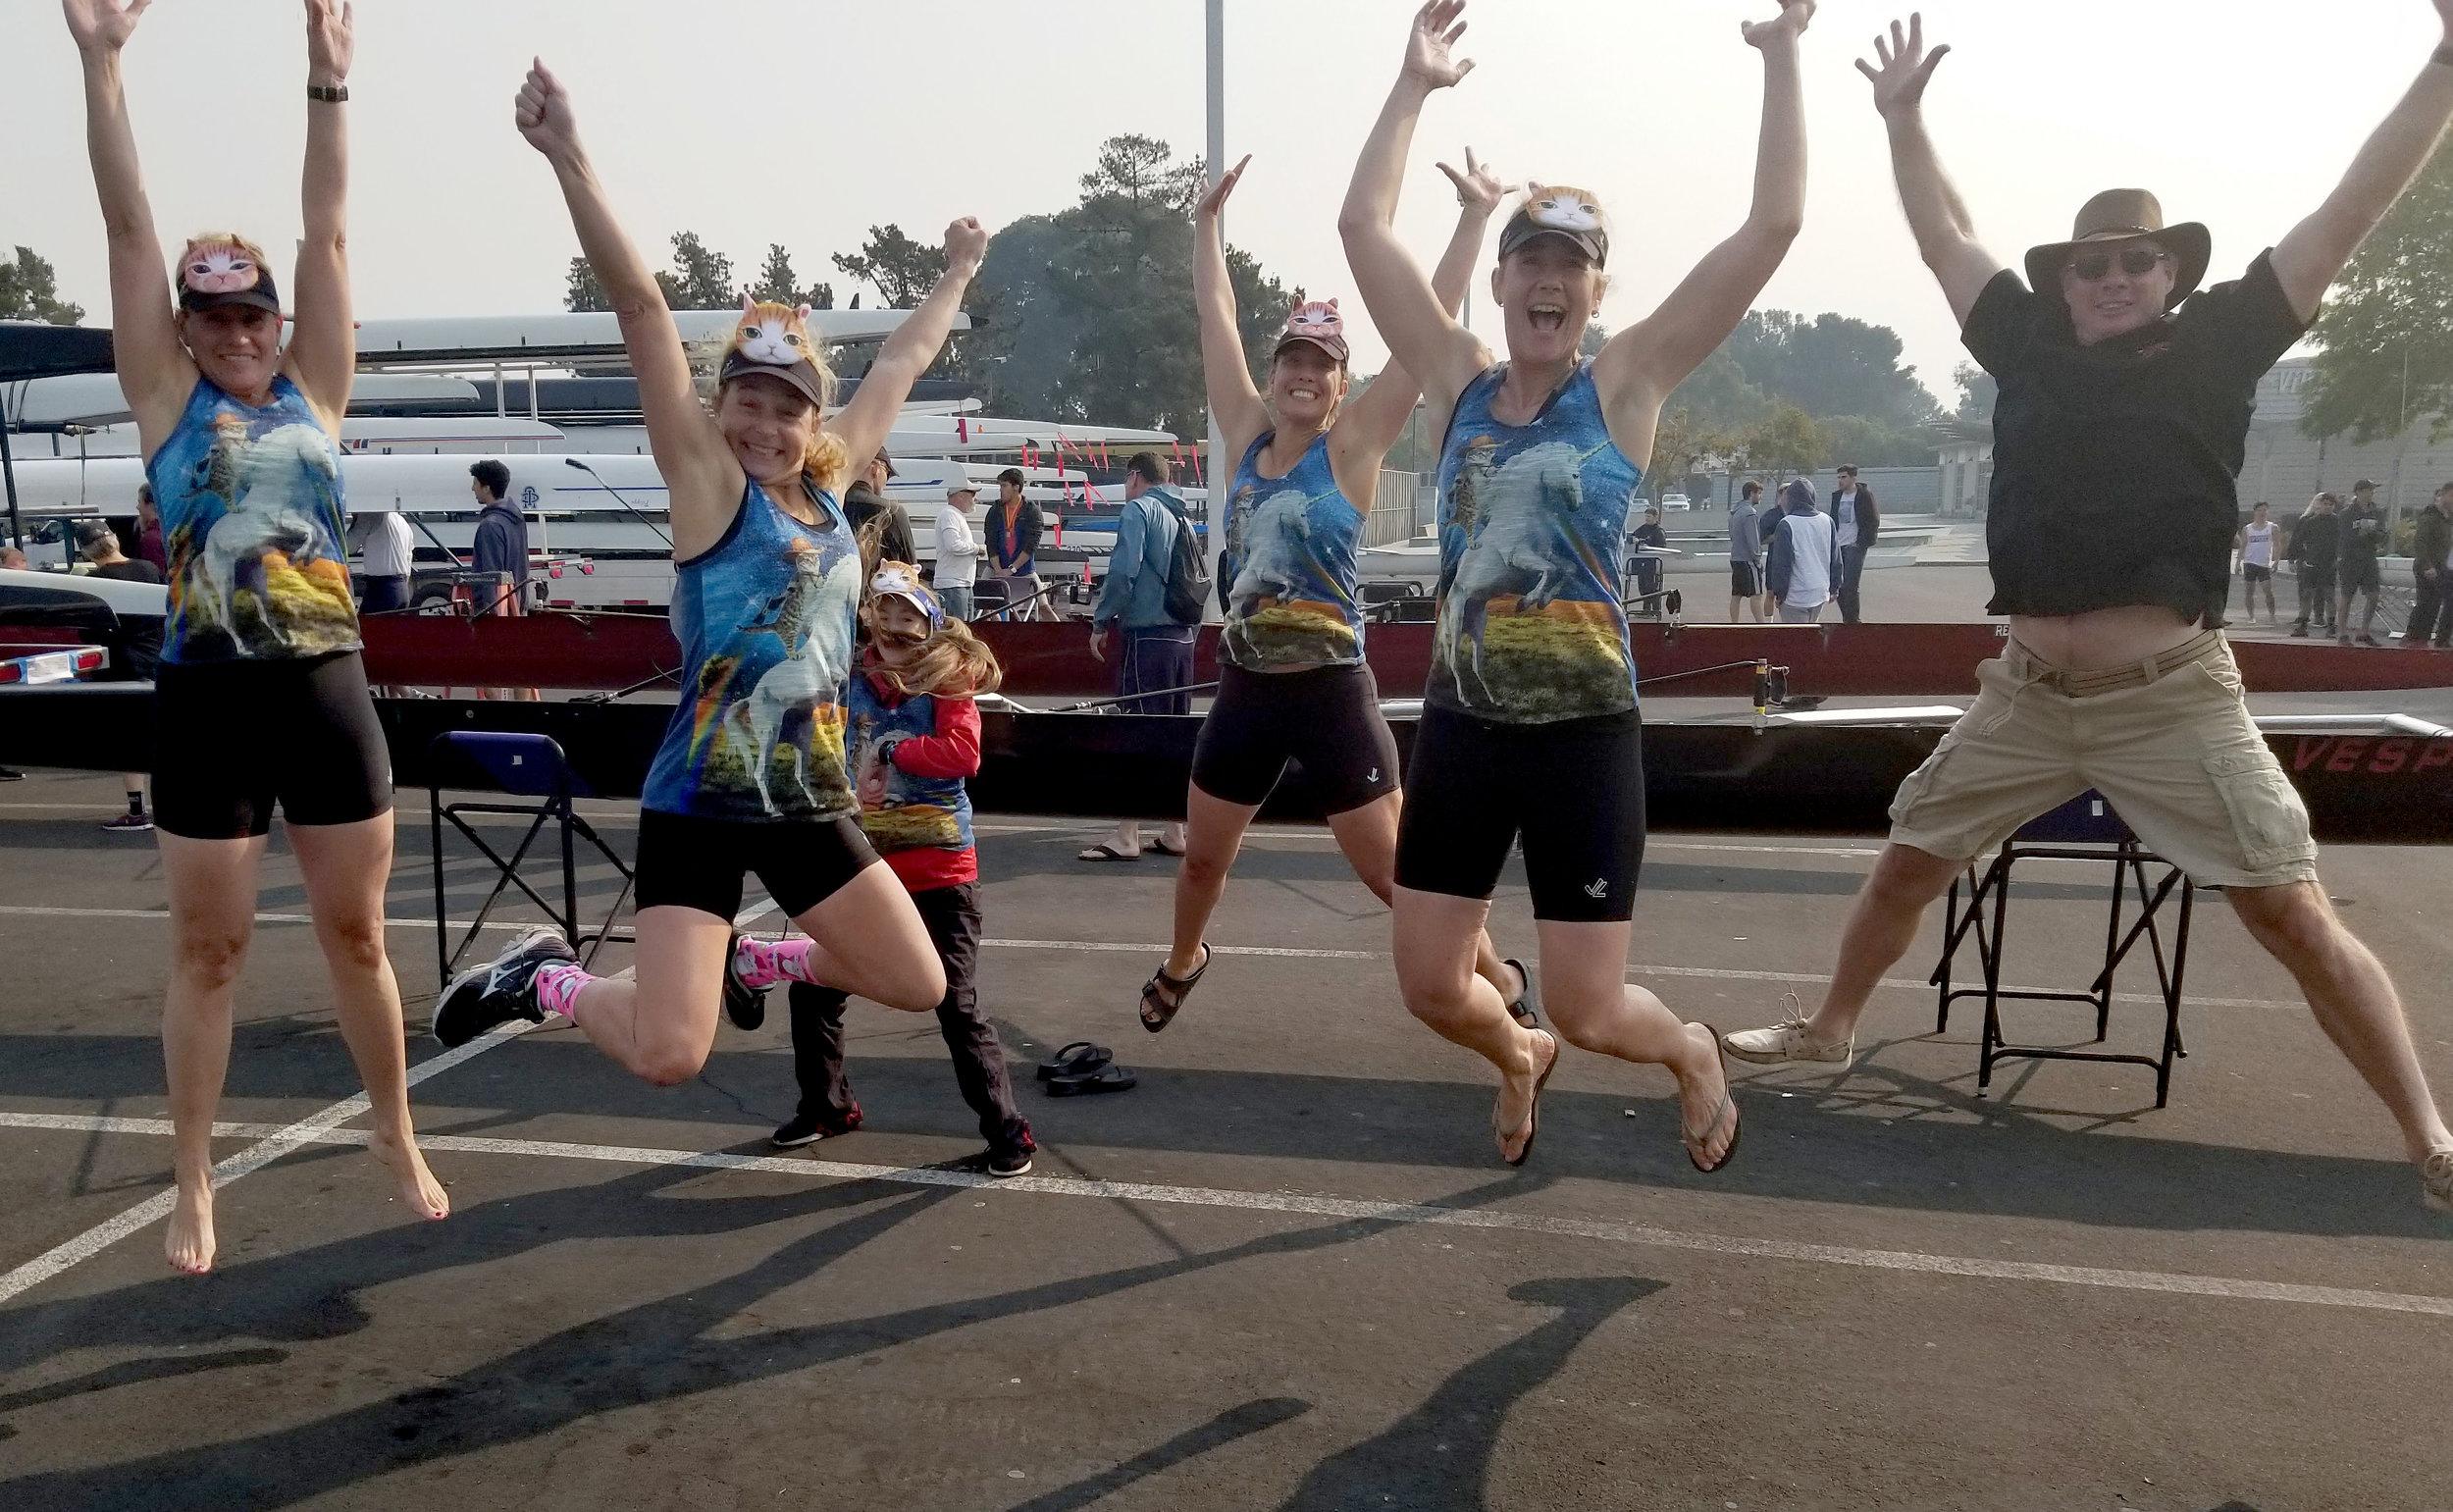 Masters Women 4+ at the Lagoon. 📷credit: Loring Weidner.